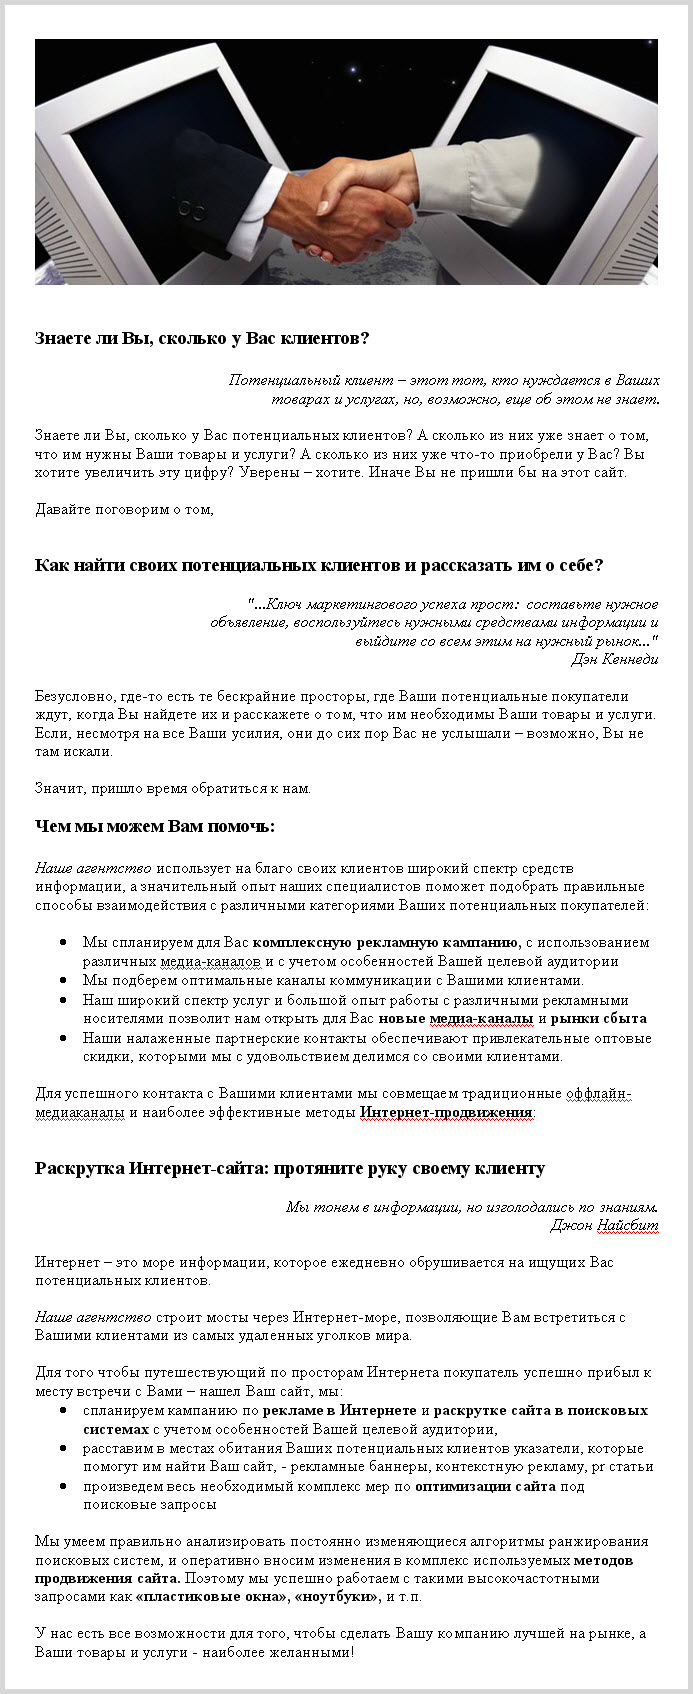 Текст для сайта интернет-агентства